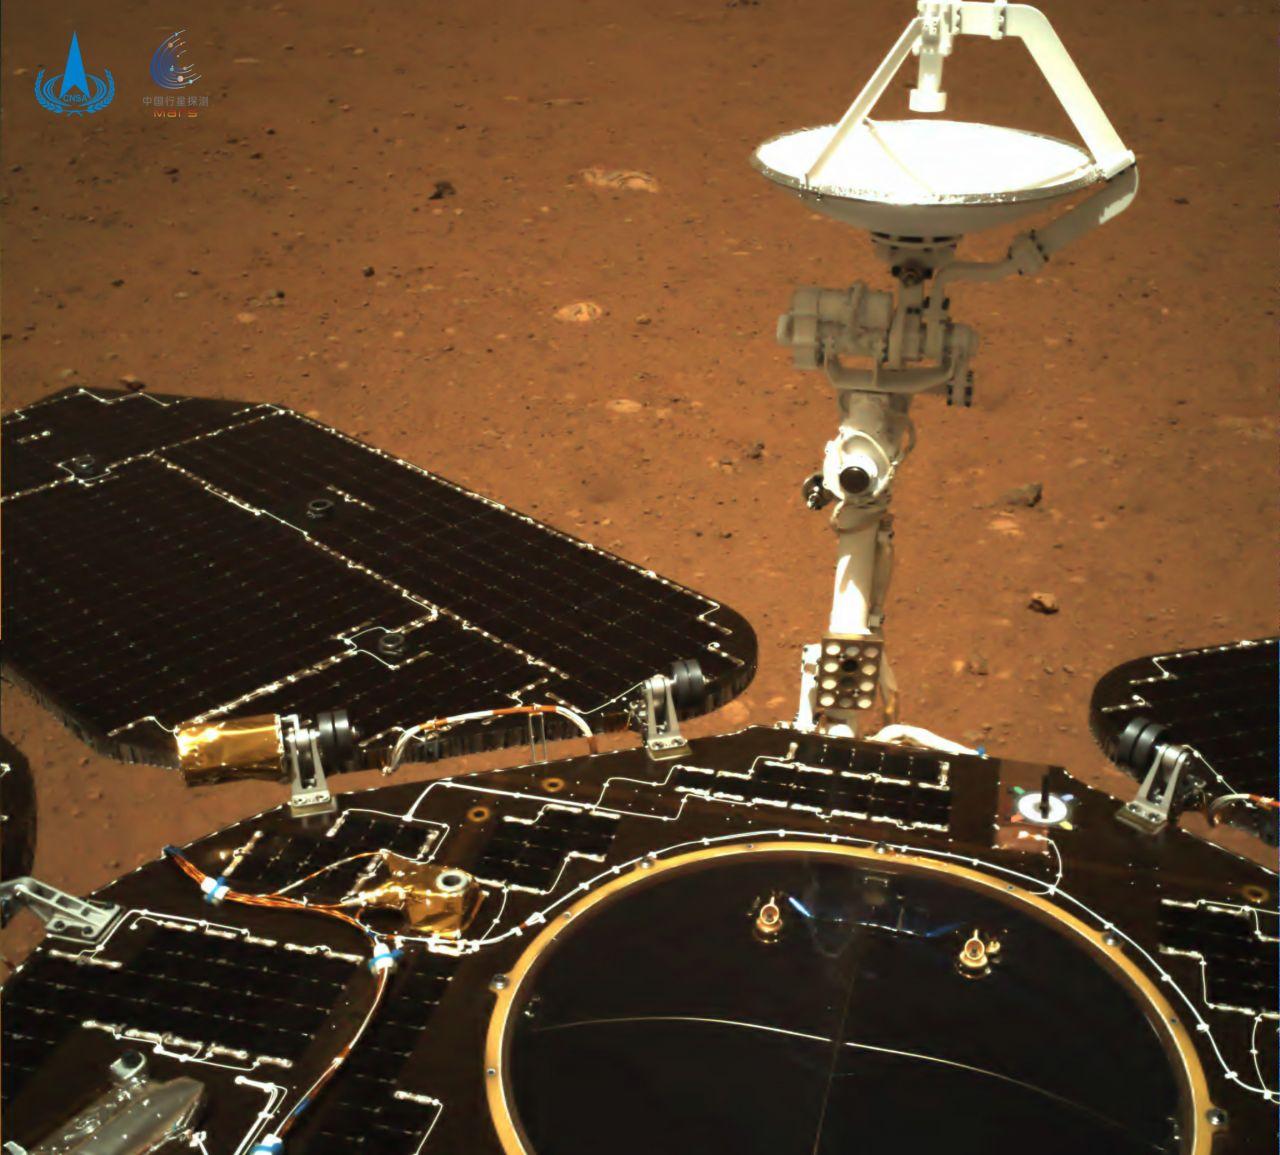 Erste Bilder vom Mars-Rover-Zhurong